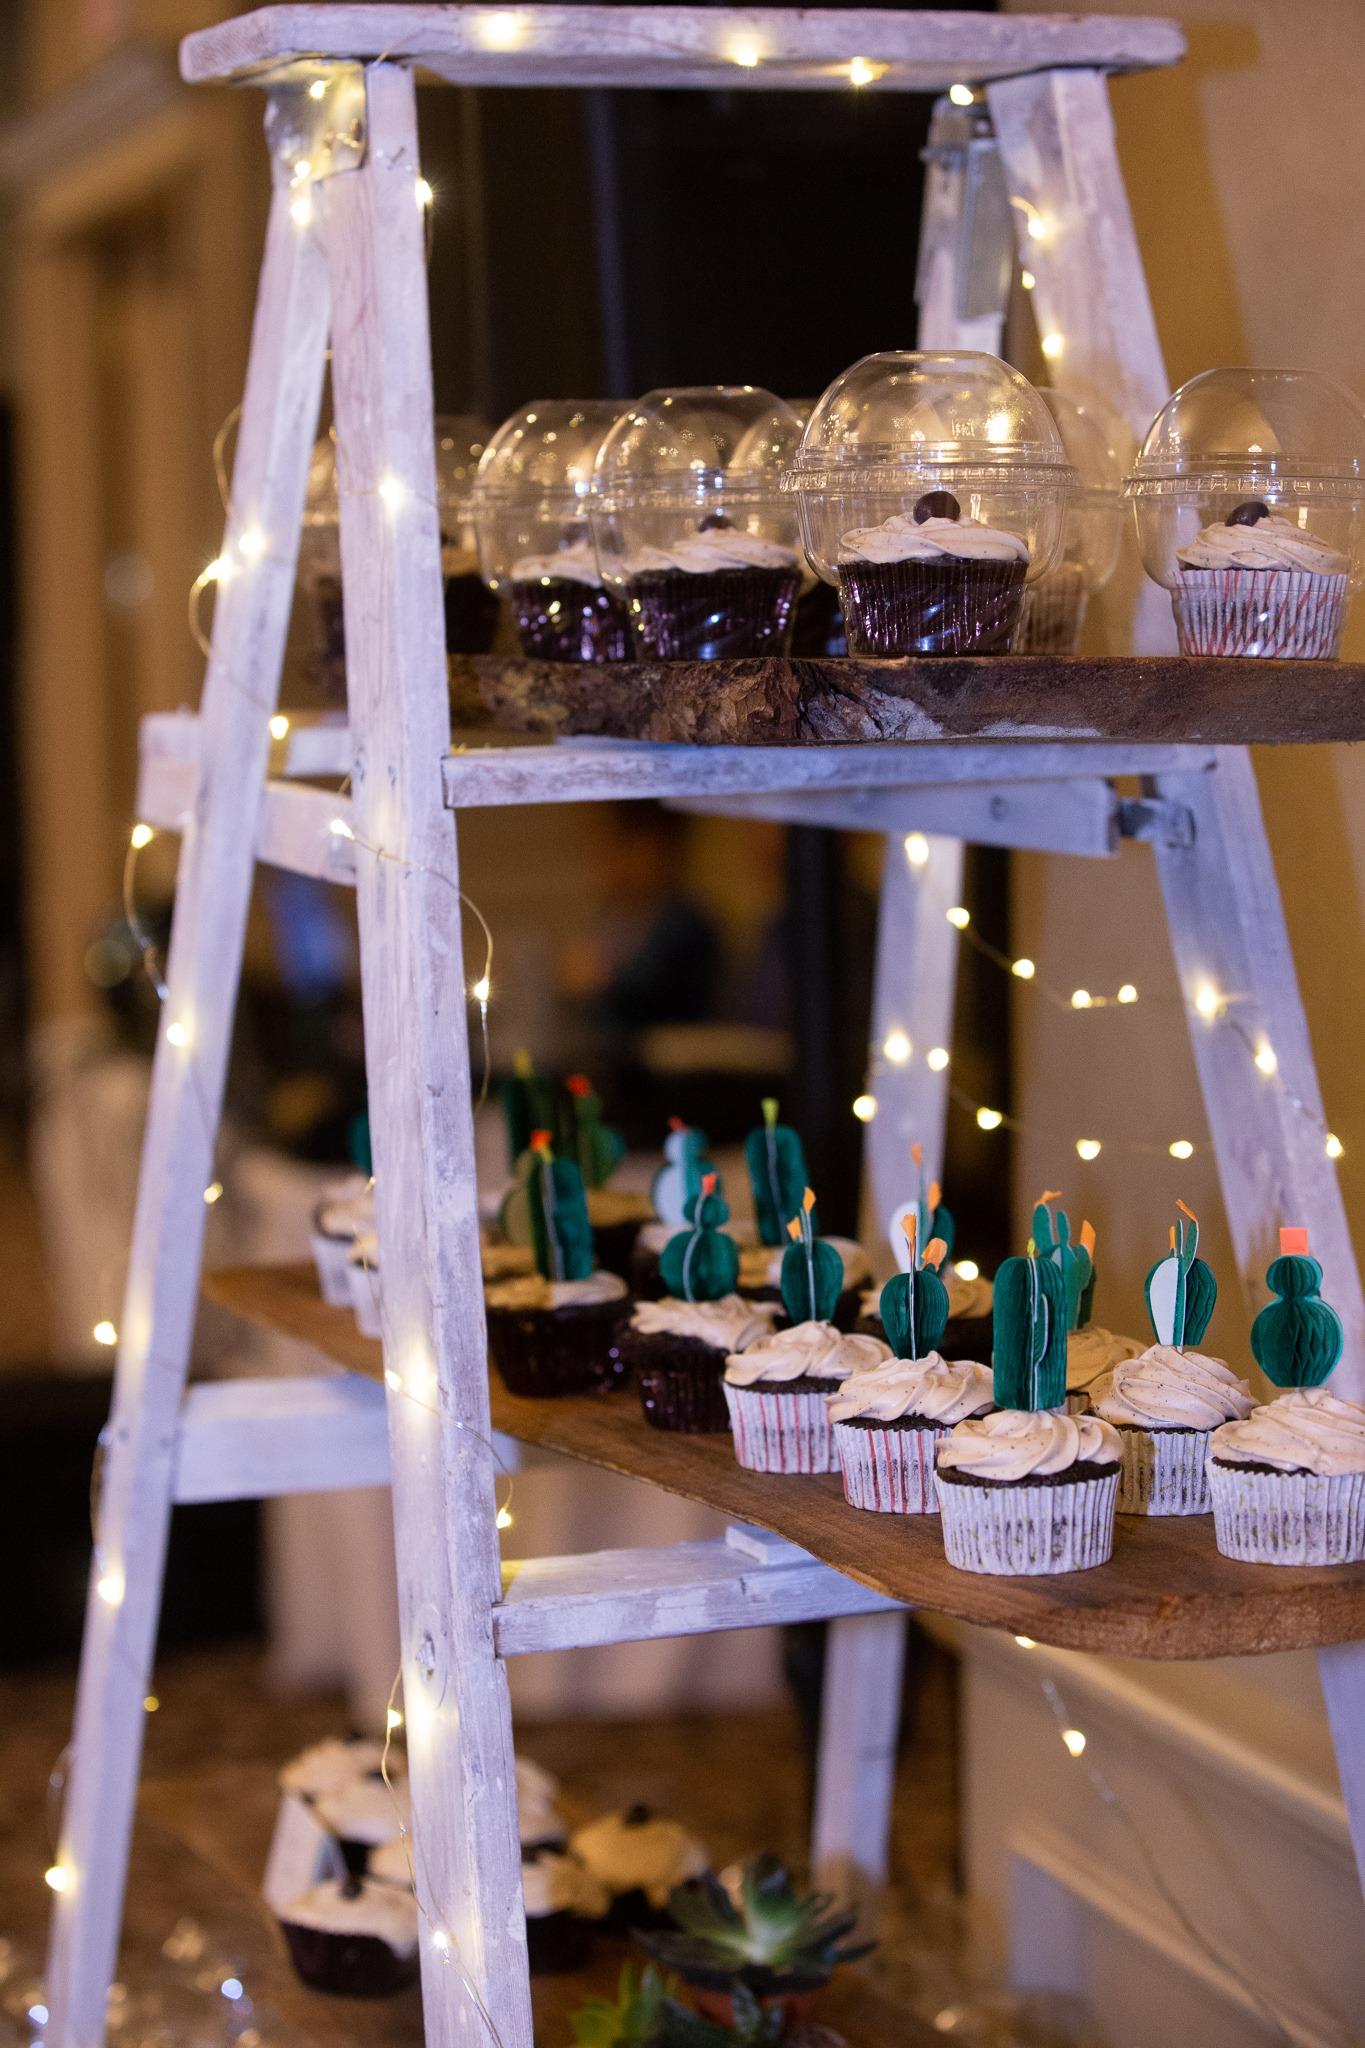 wedding desserts on a decorative ladder with lights